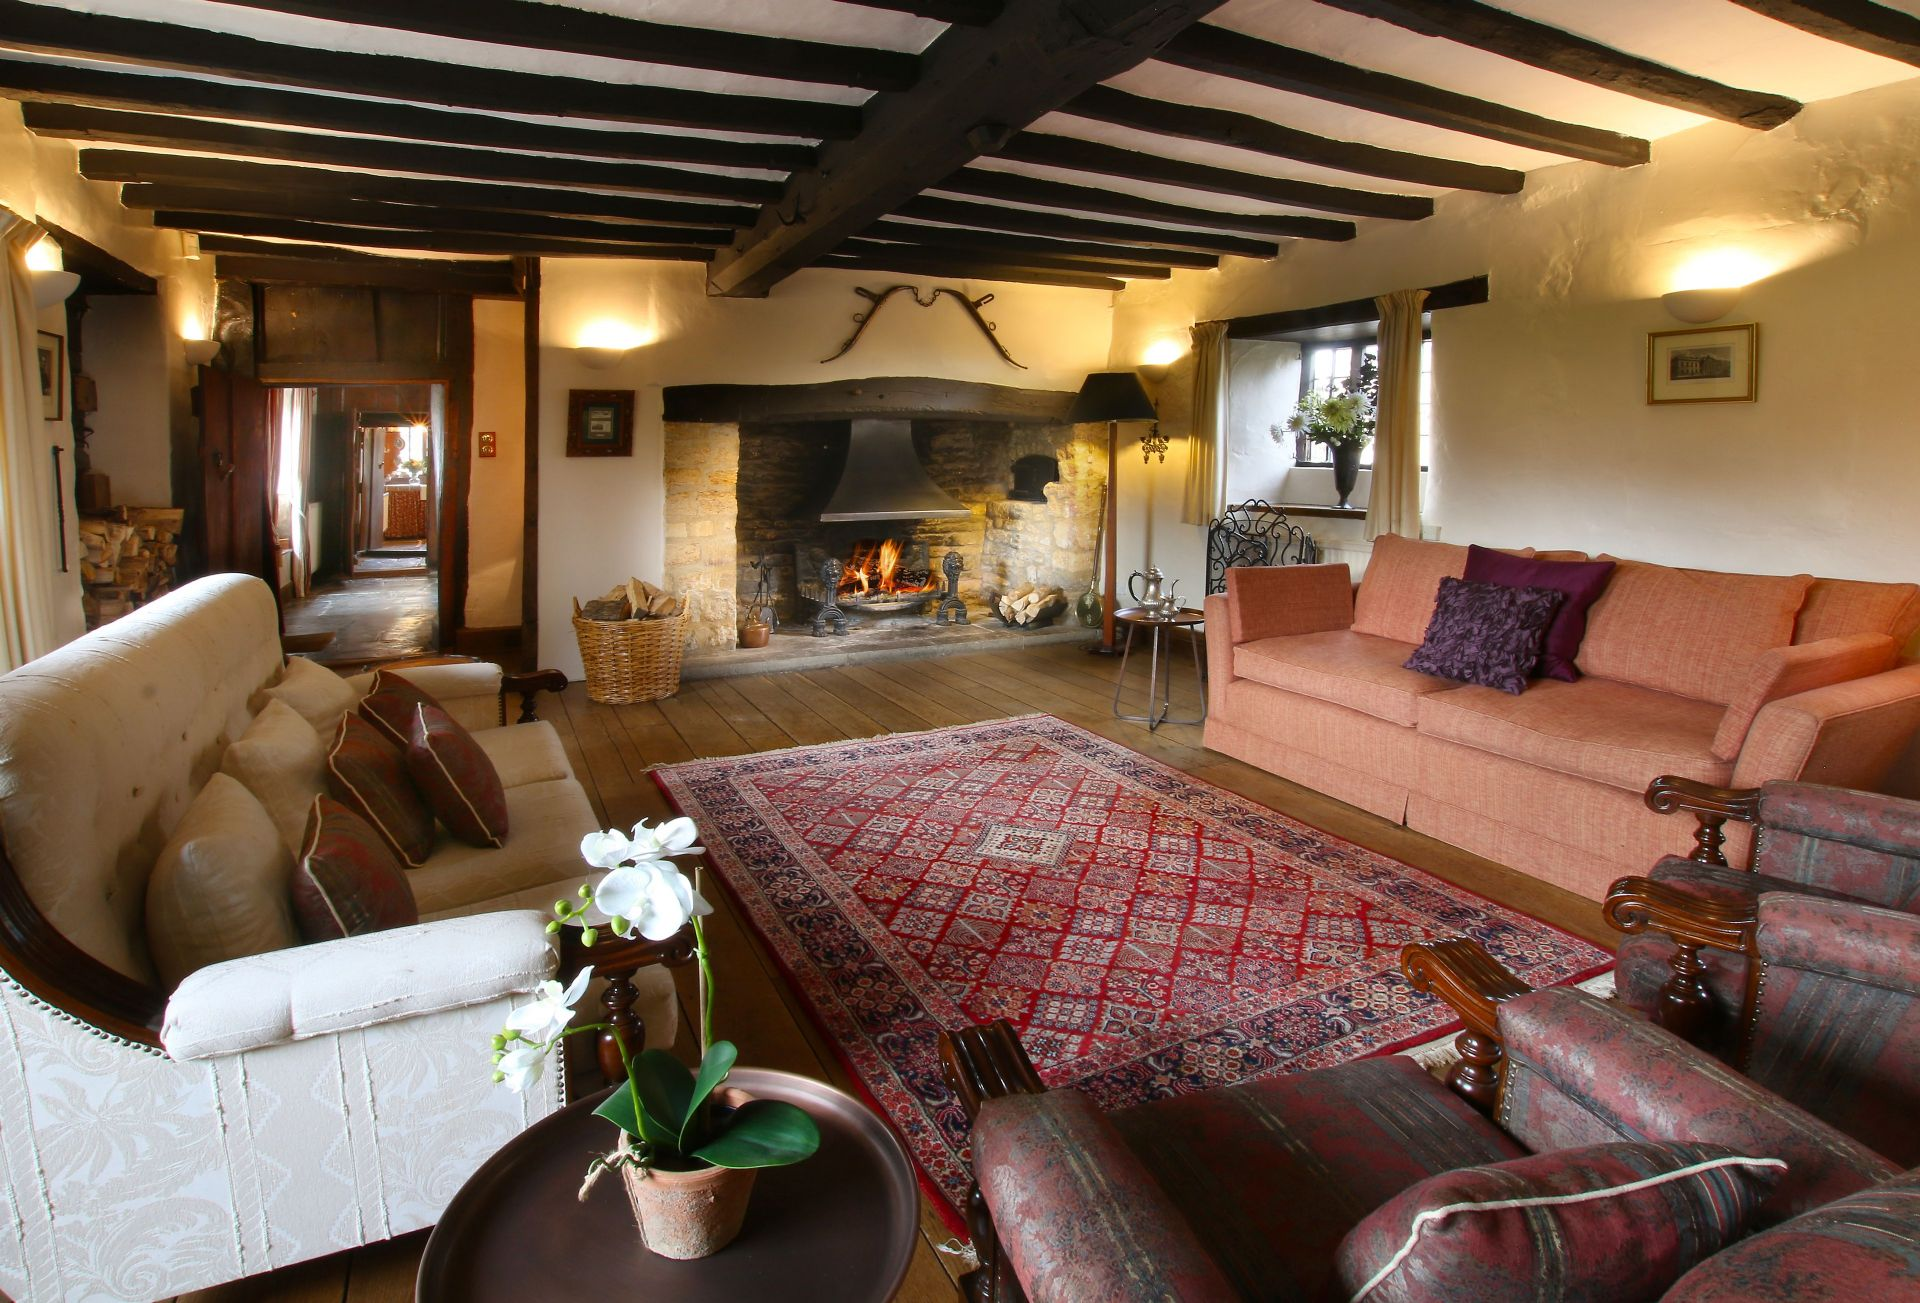 Ground floor:  Elegant sitting room with inglenook fireplace